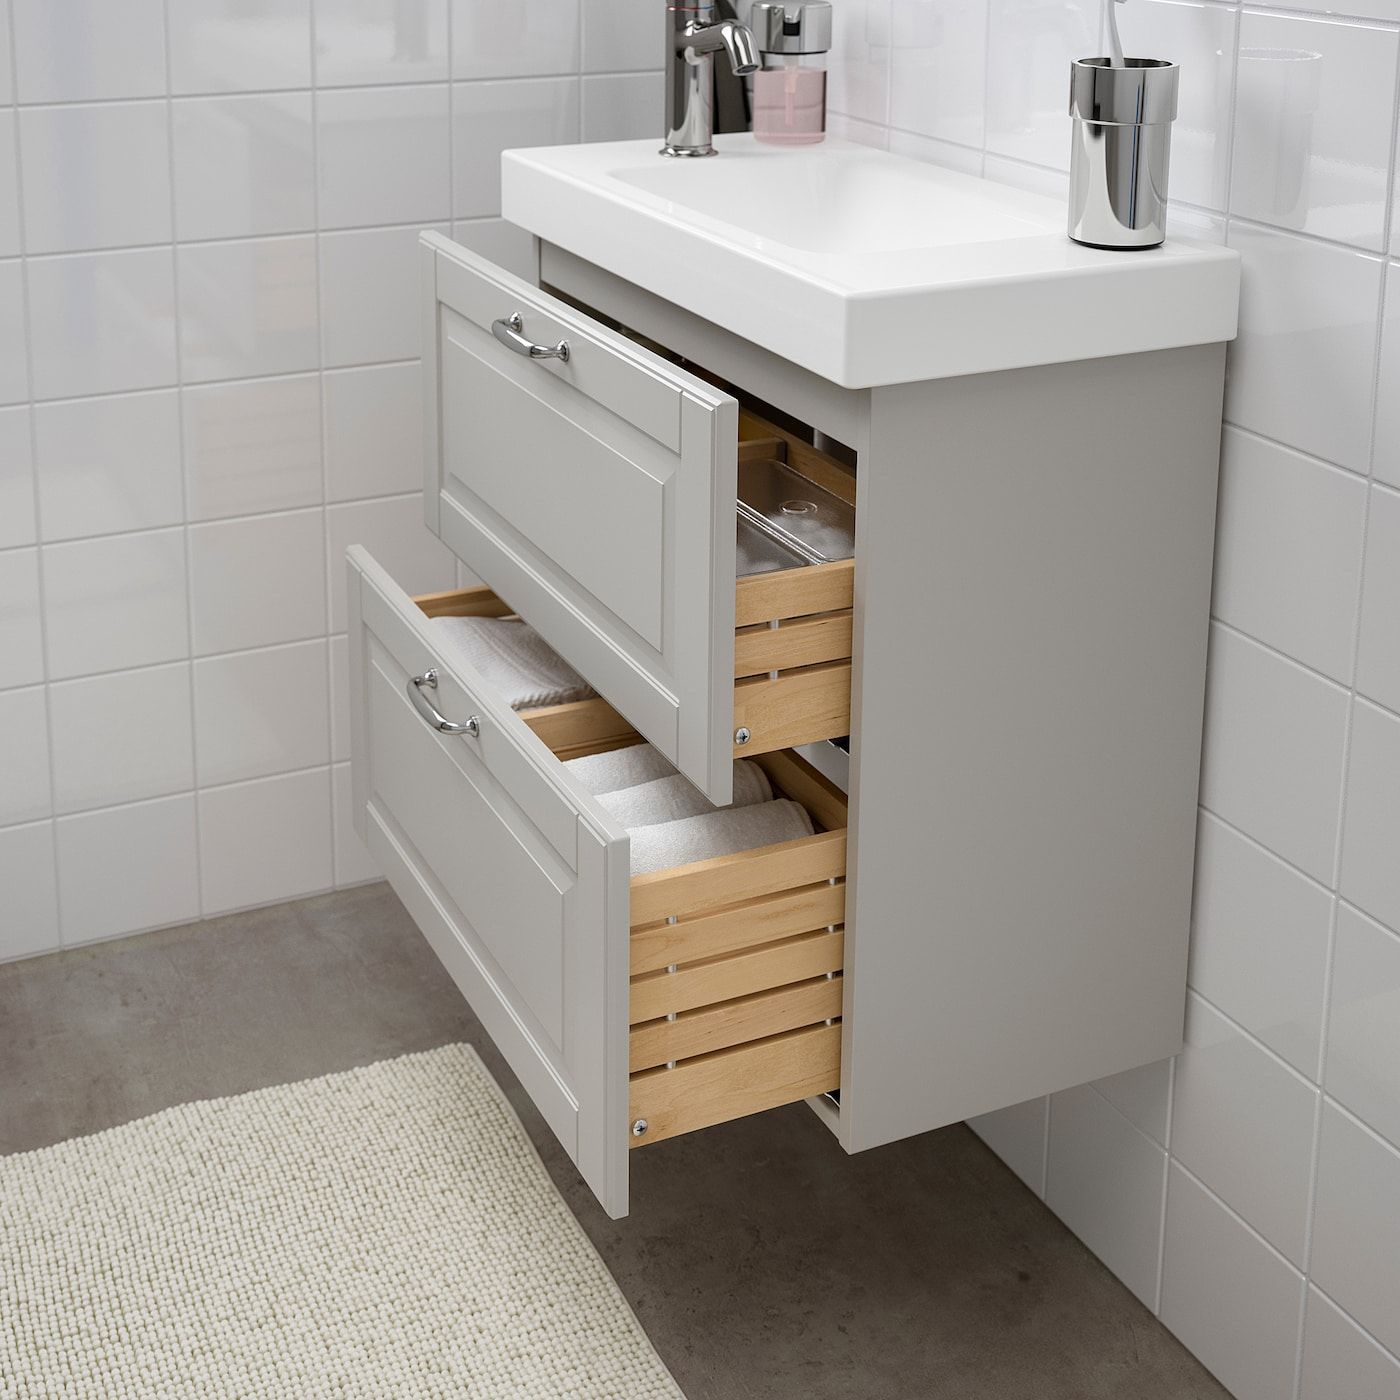 Ikea Godmorgon Hagaviken Bathroom Vanity Kasjon Light Gray Voxnan In 2020 Ikea Badezimmer Waschbeckenschrank Ikea Waschbecken